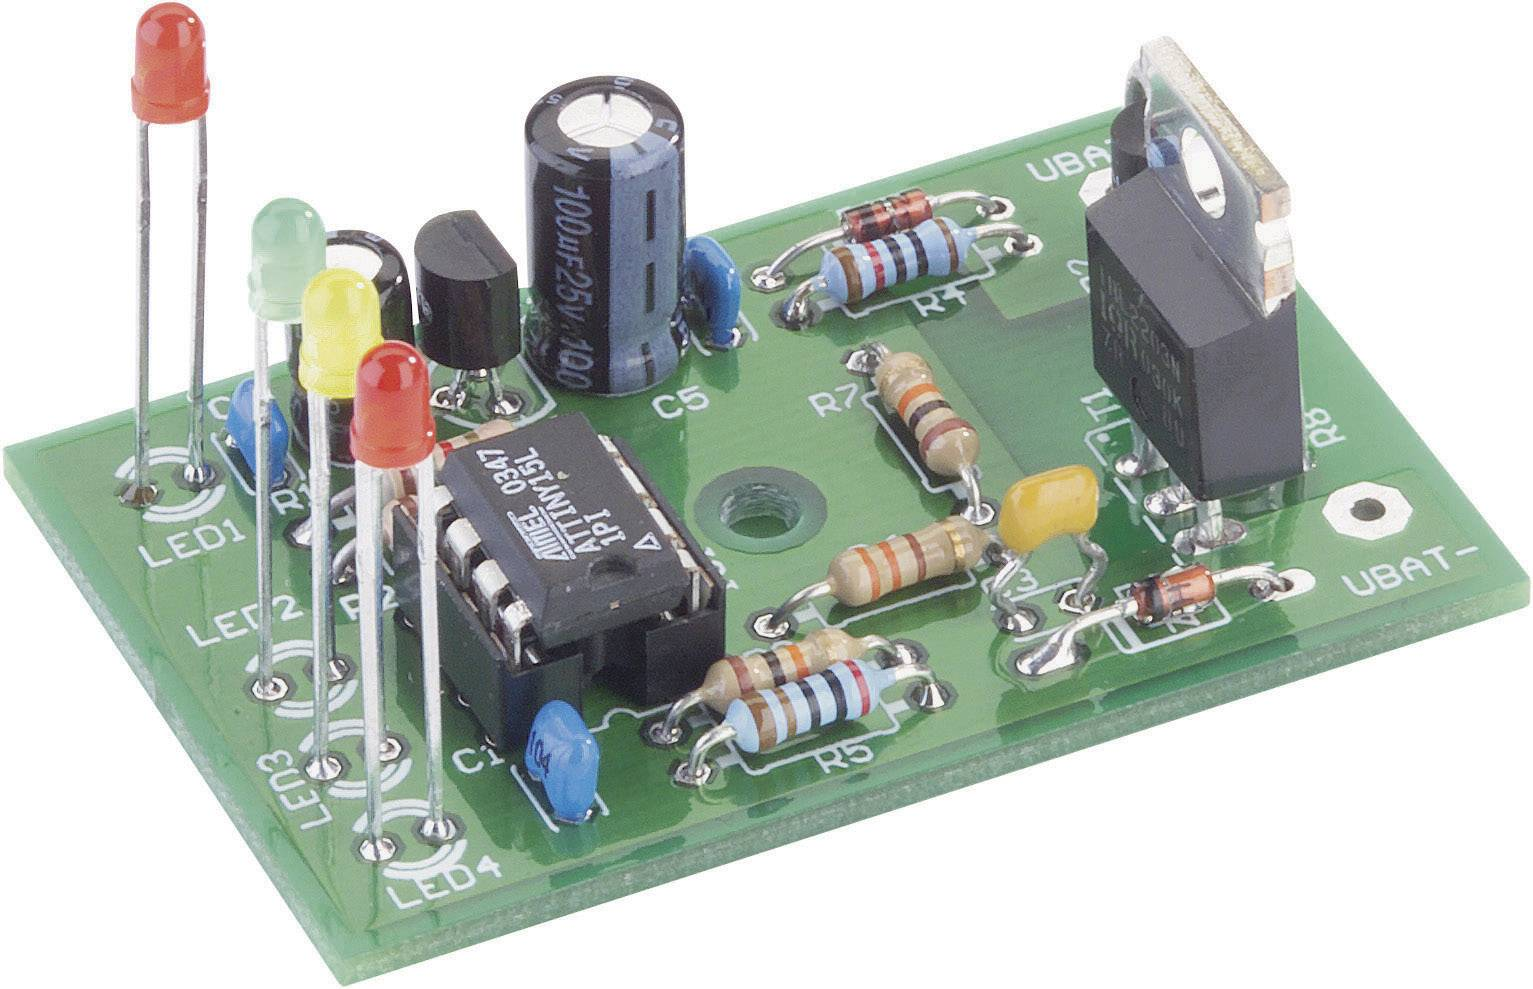 Aktivátor olověných akumulátorů H-Tronic, 52 x 34 x 28 mm, 12 V/DC